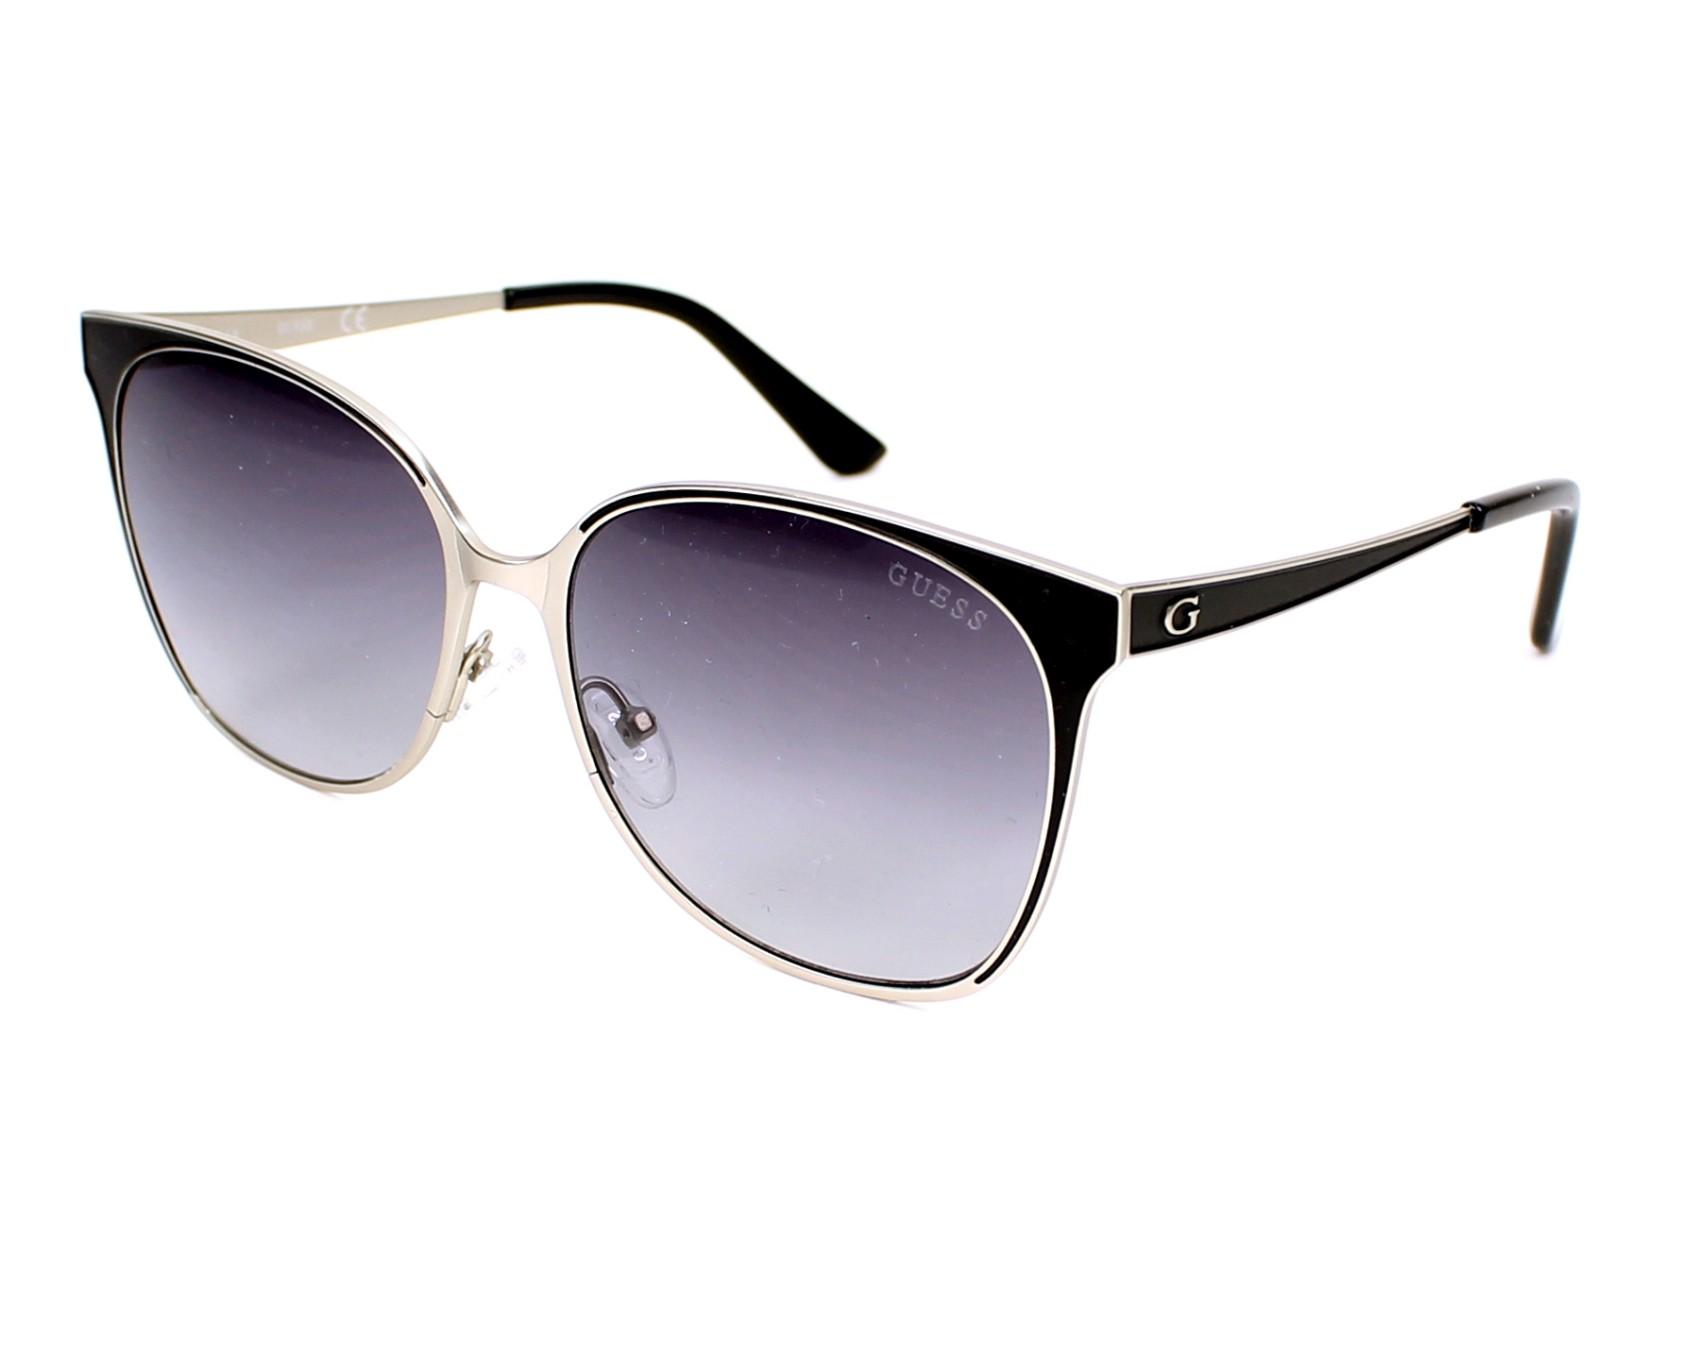 Guess Sunglasses Black With Black Lenses Gu 7458 11b Visionet Us